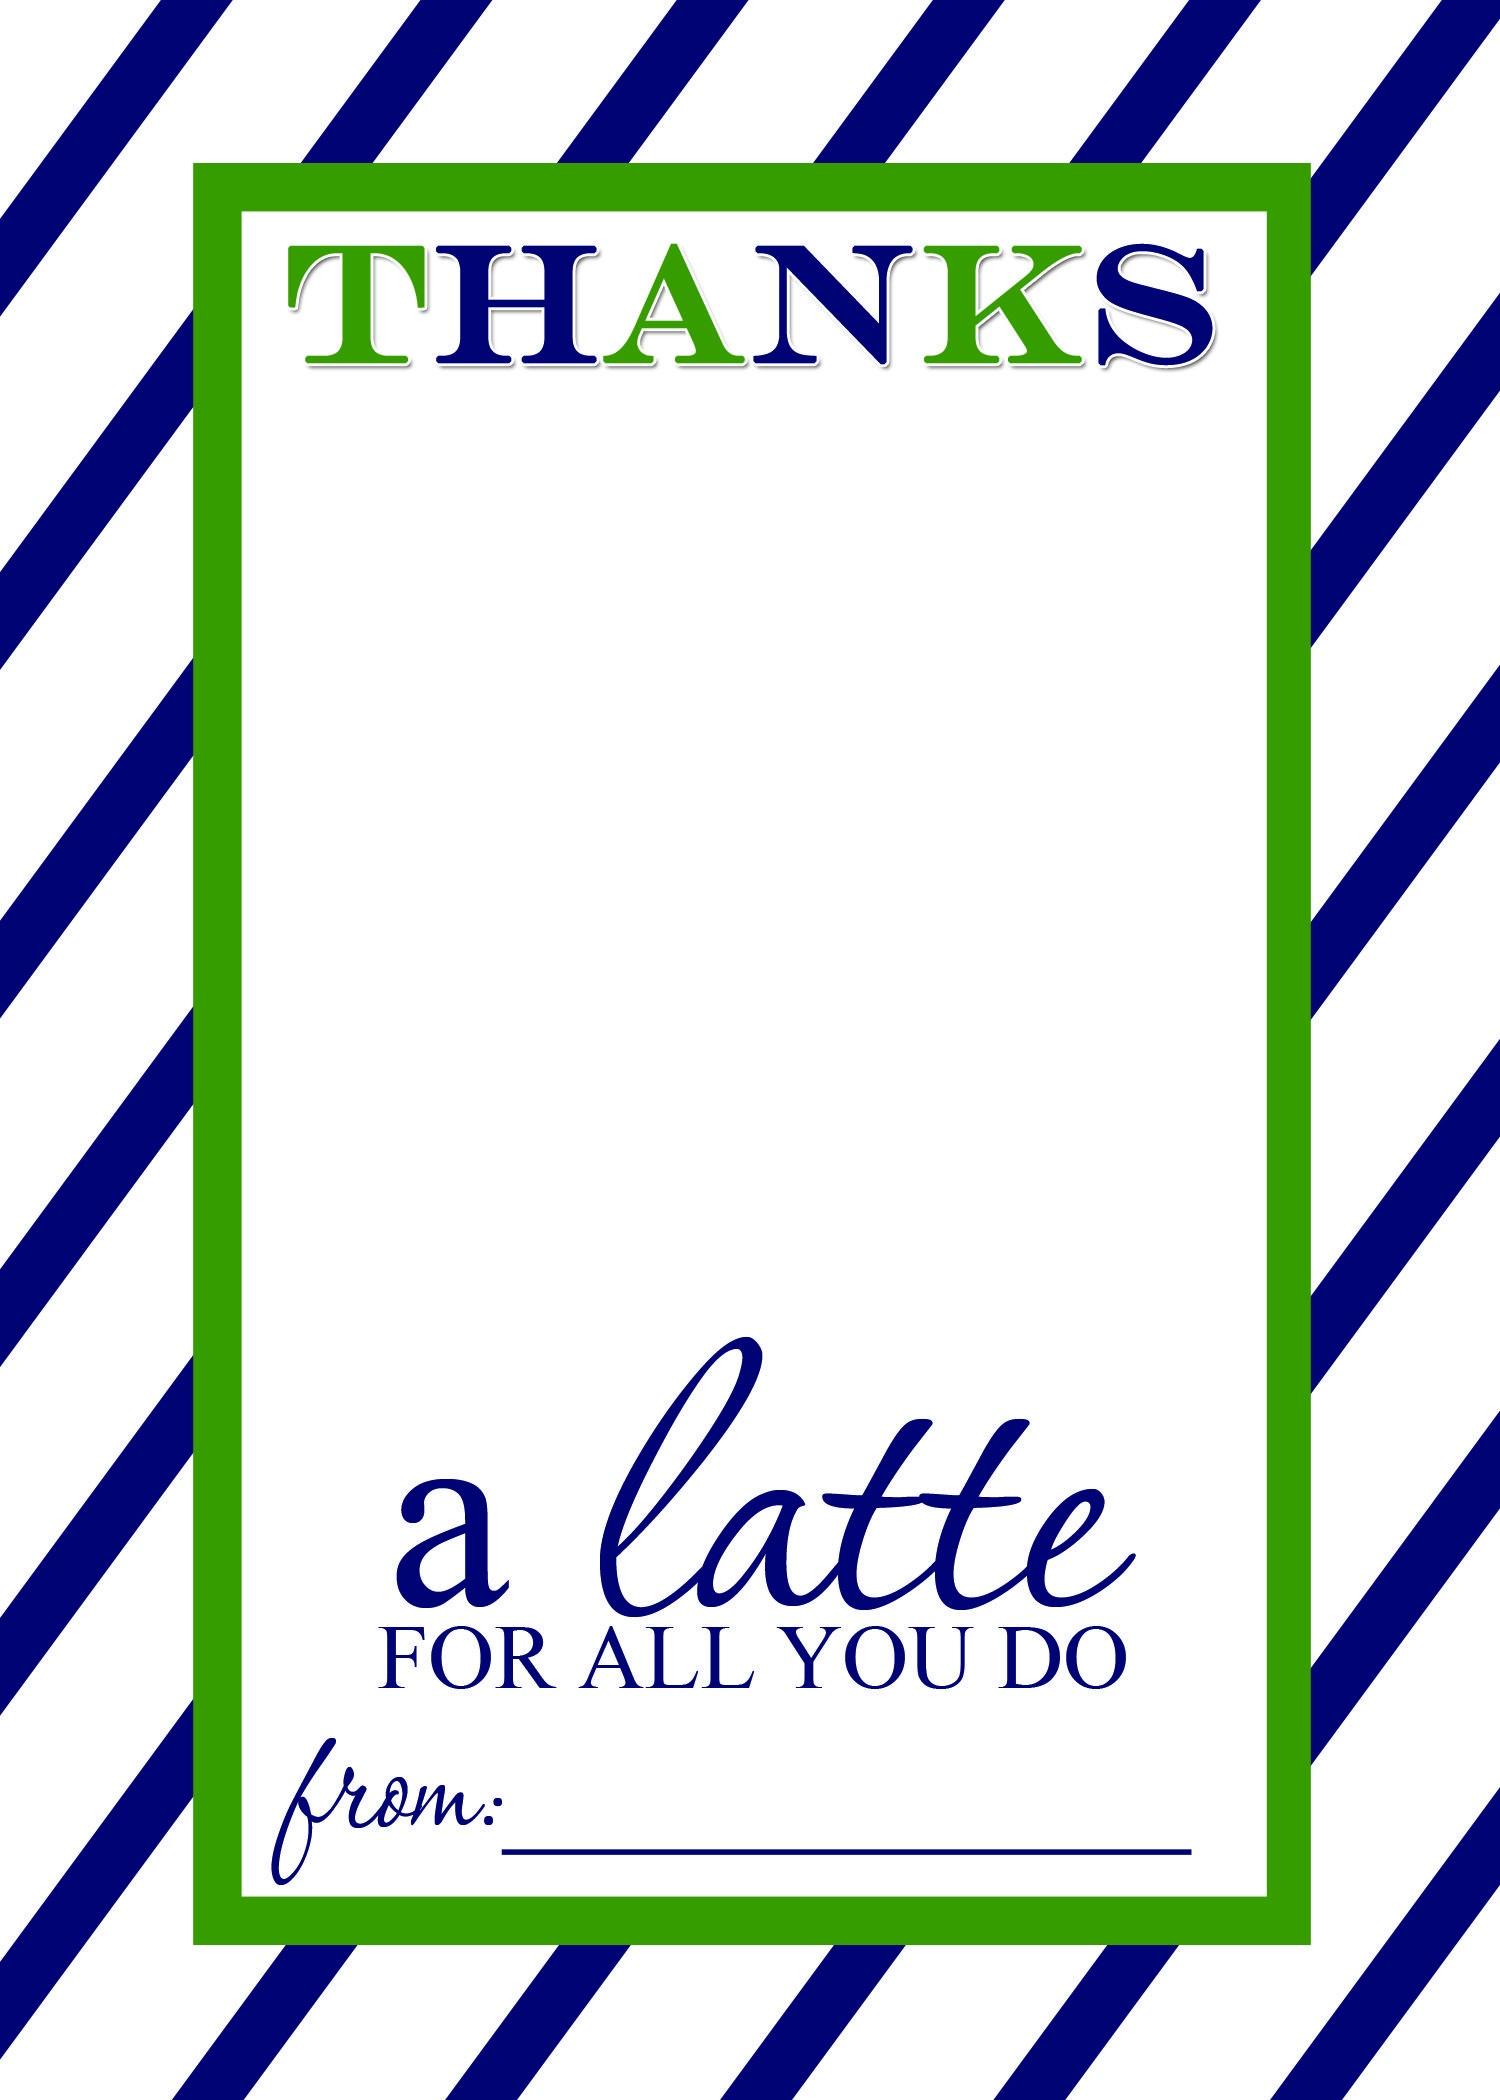 Thanks A Latte Free Printable Gift Card Holder Teacher Gift   Las - Thanks A Latte Free Printable